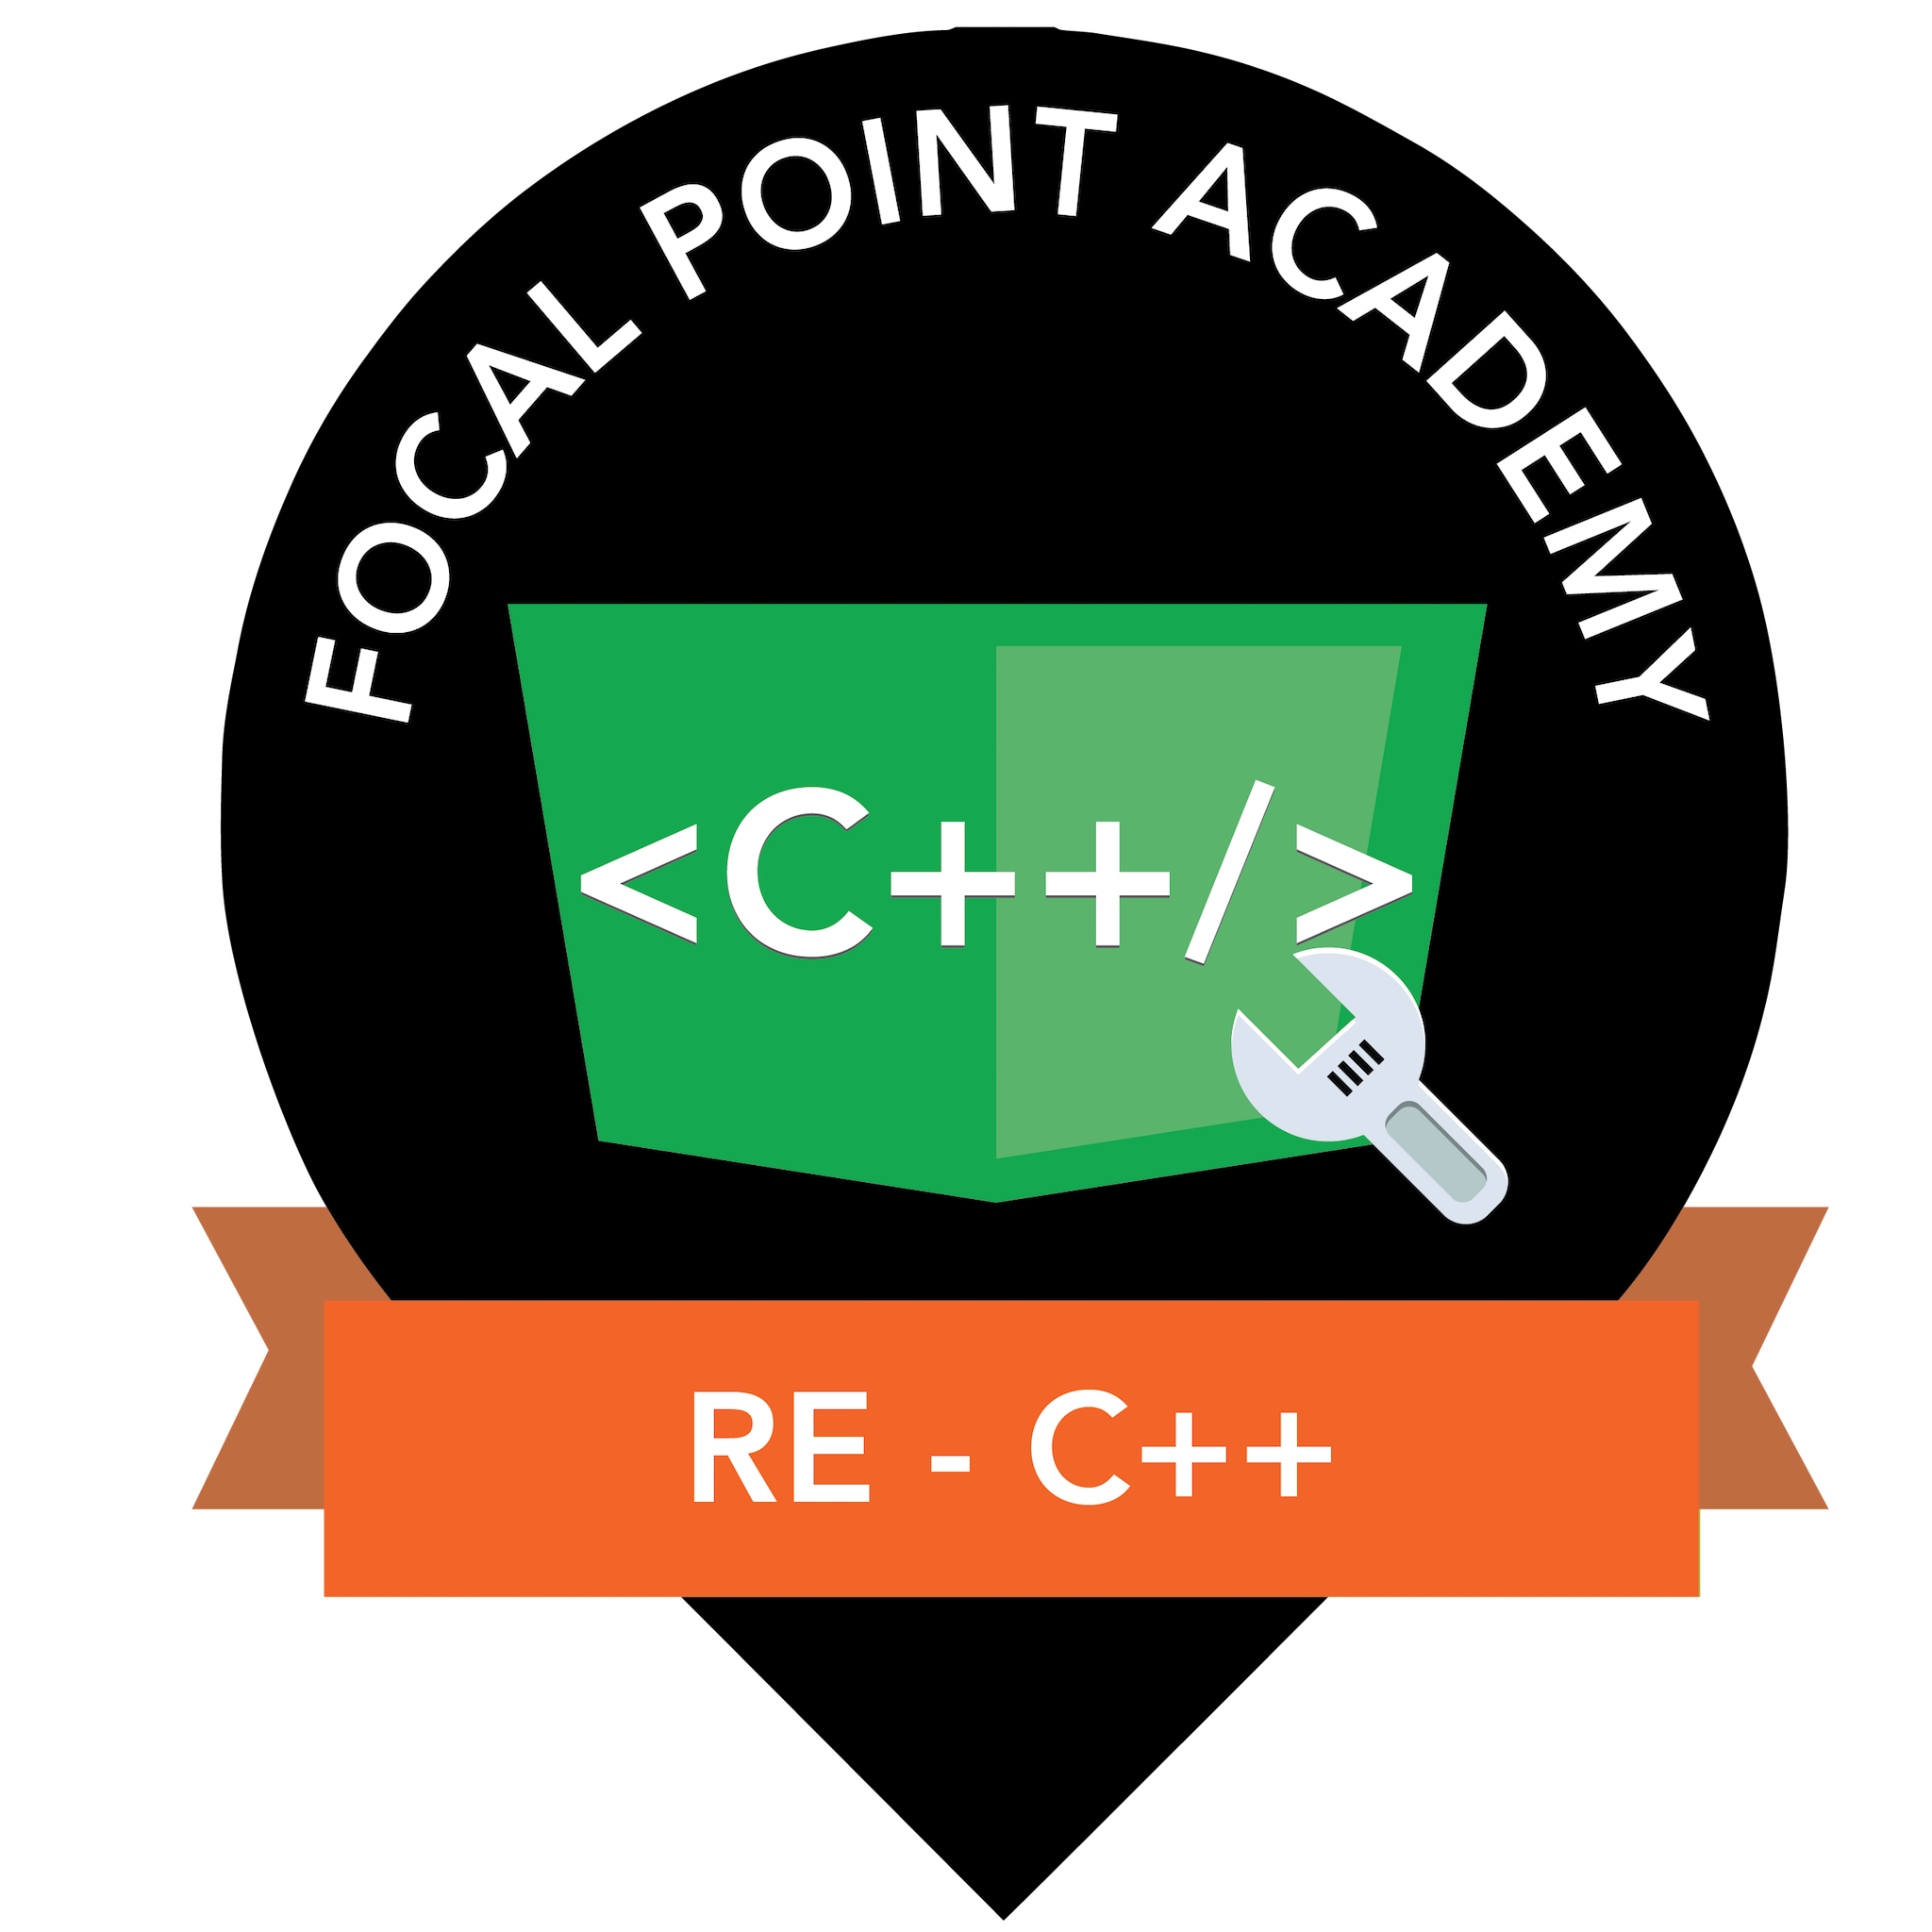 Reverse Engineering C++ Programs